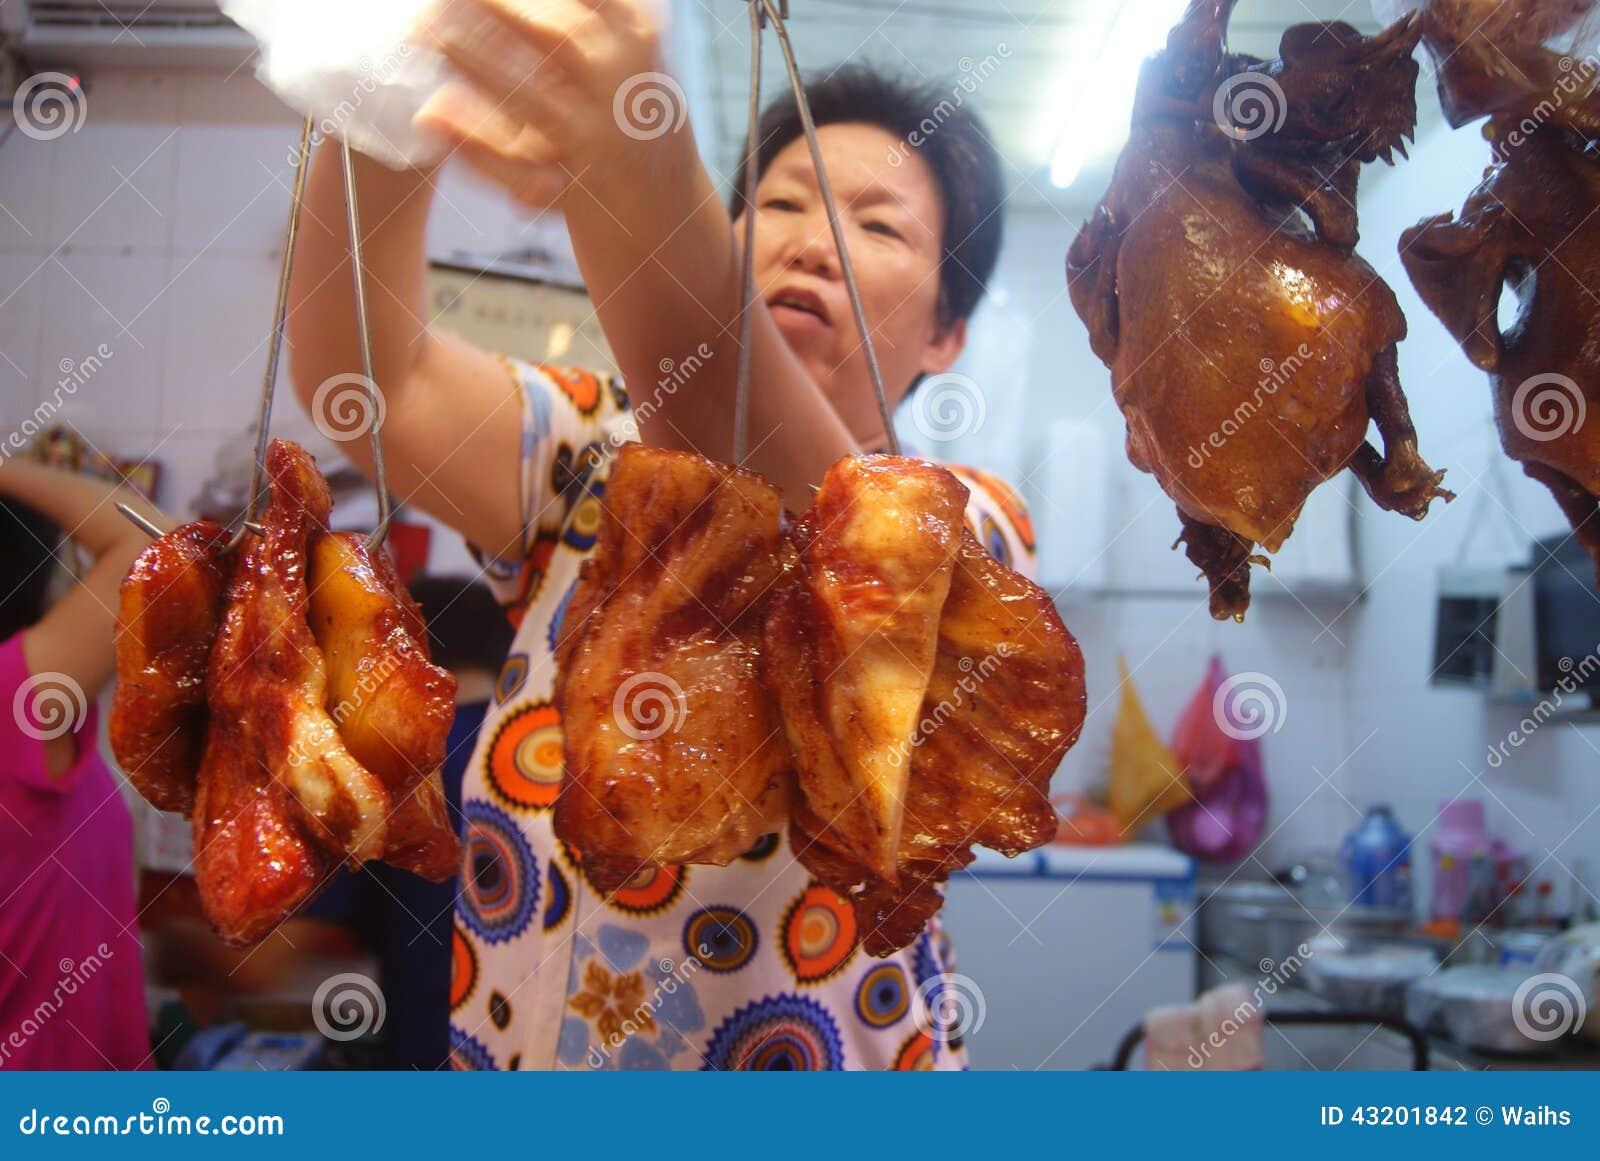 Download Shenzhen Kina: Stekkött Shoppar Redaktionell Arkivbild - Bild av produkter, askfat: 43201842